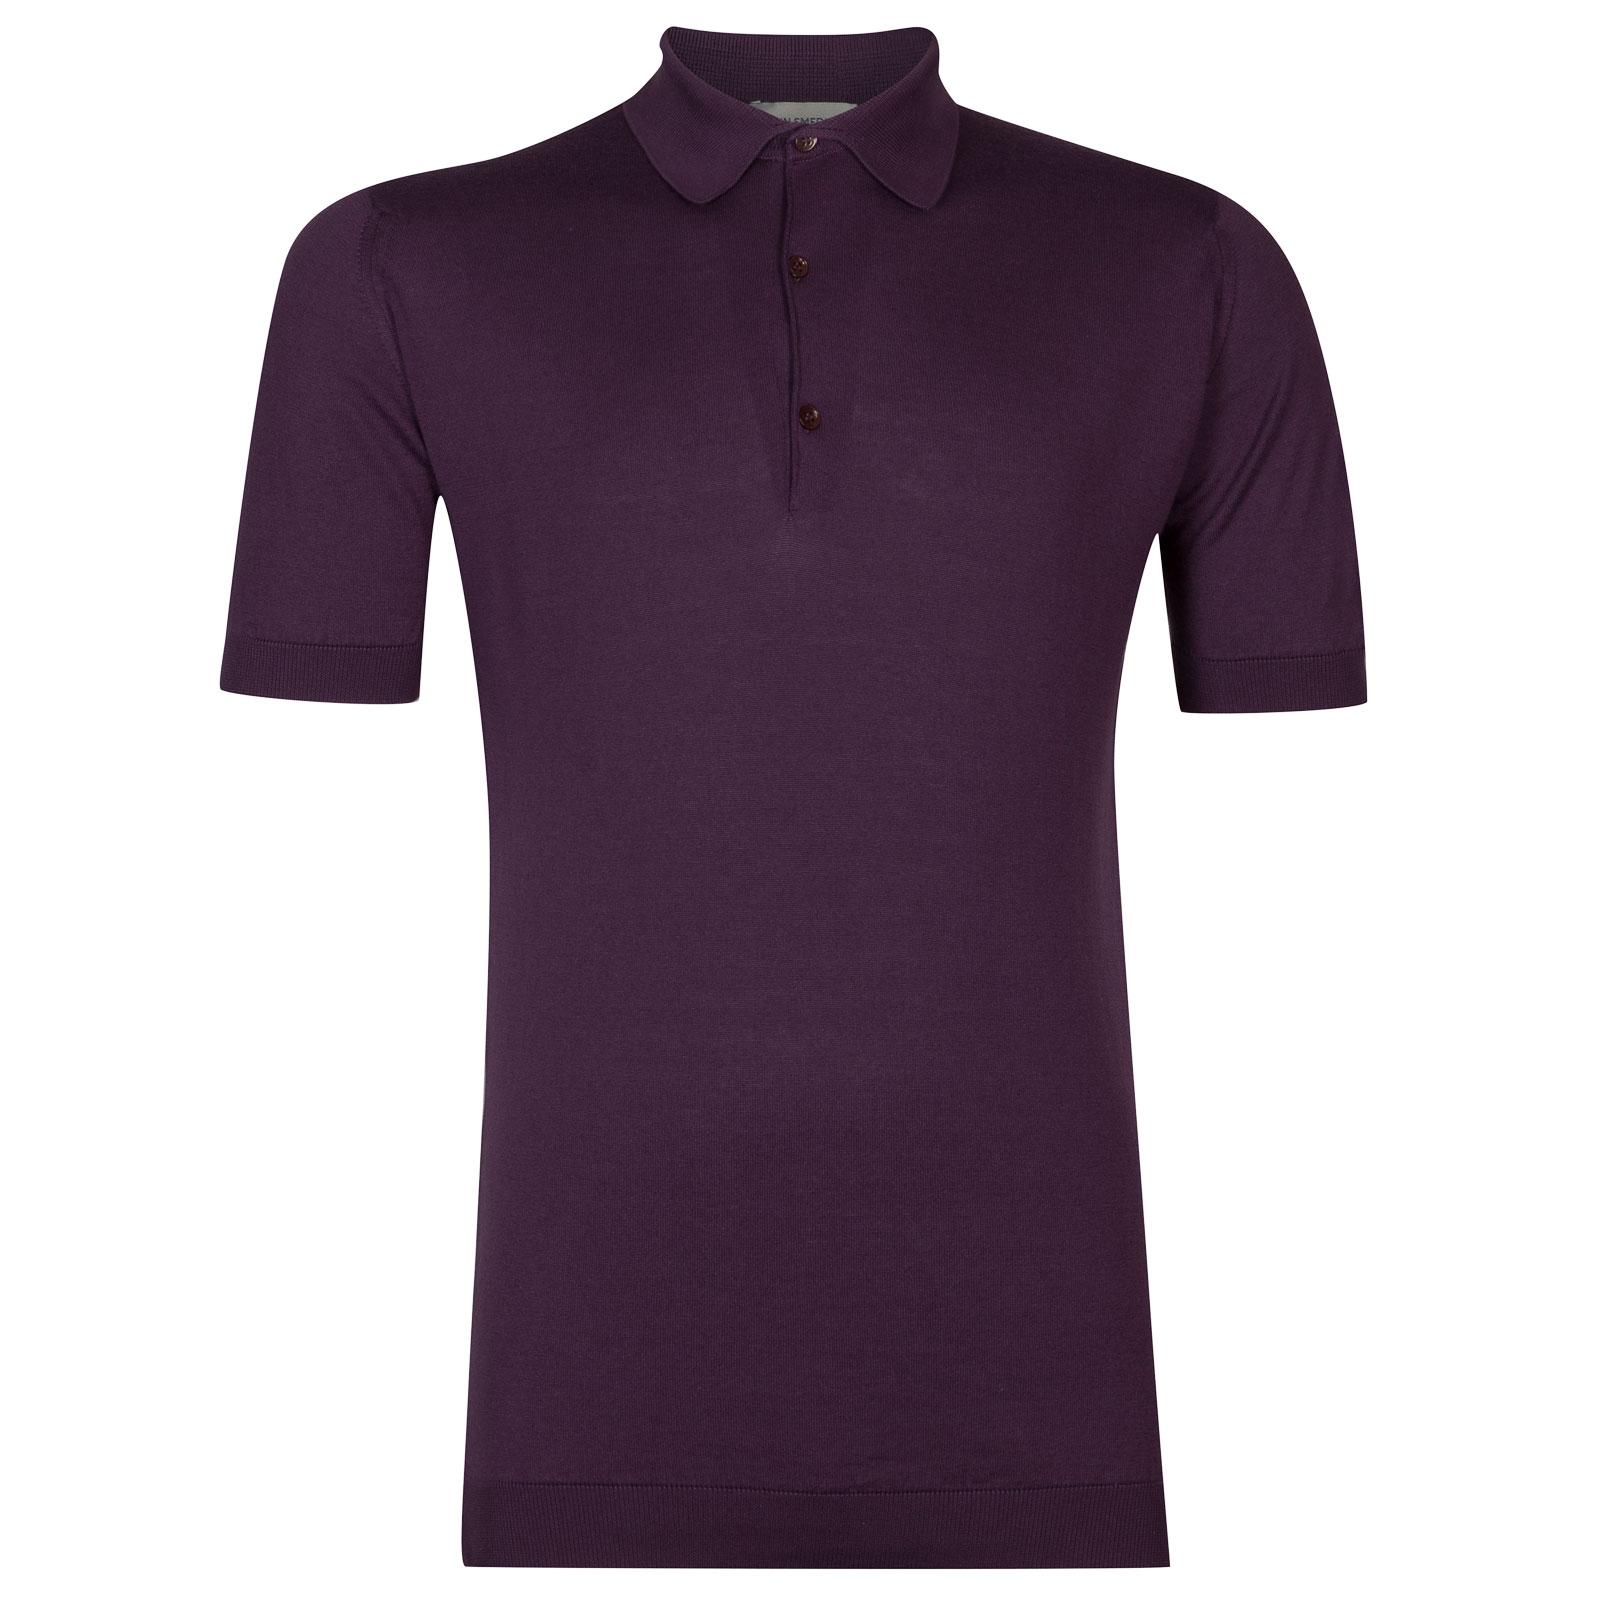 adrian-bauhaus-purple-S